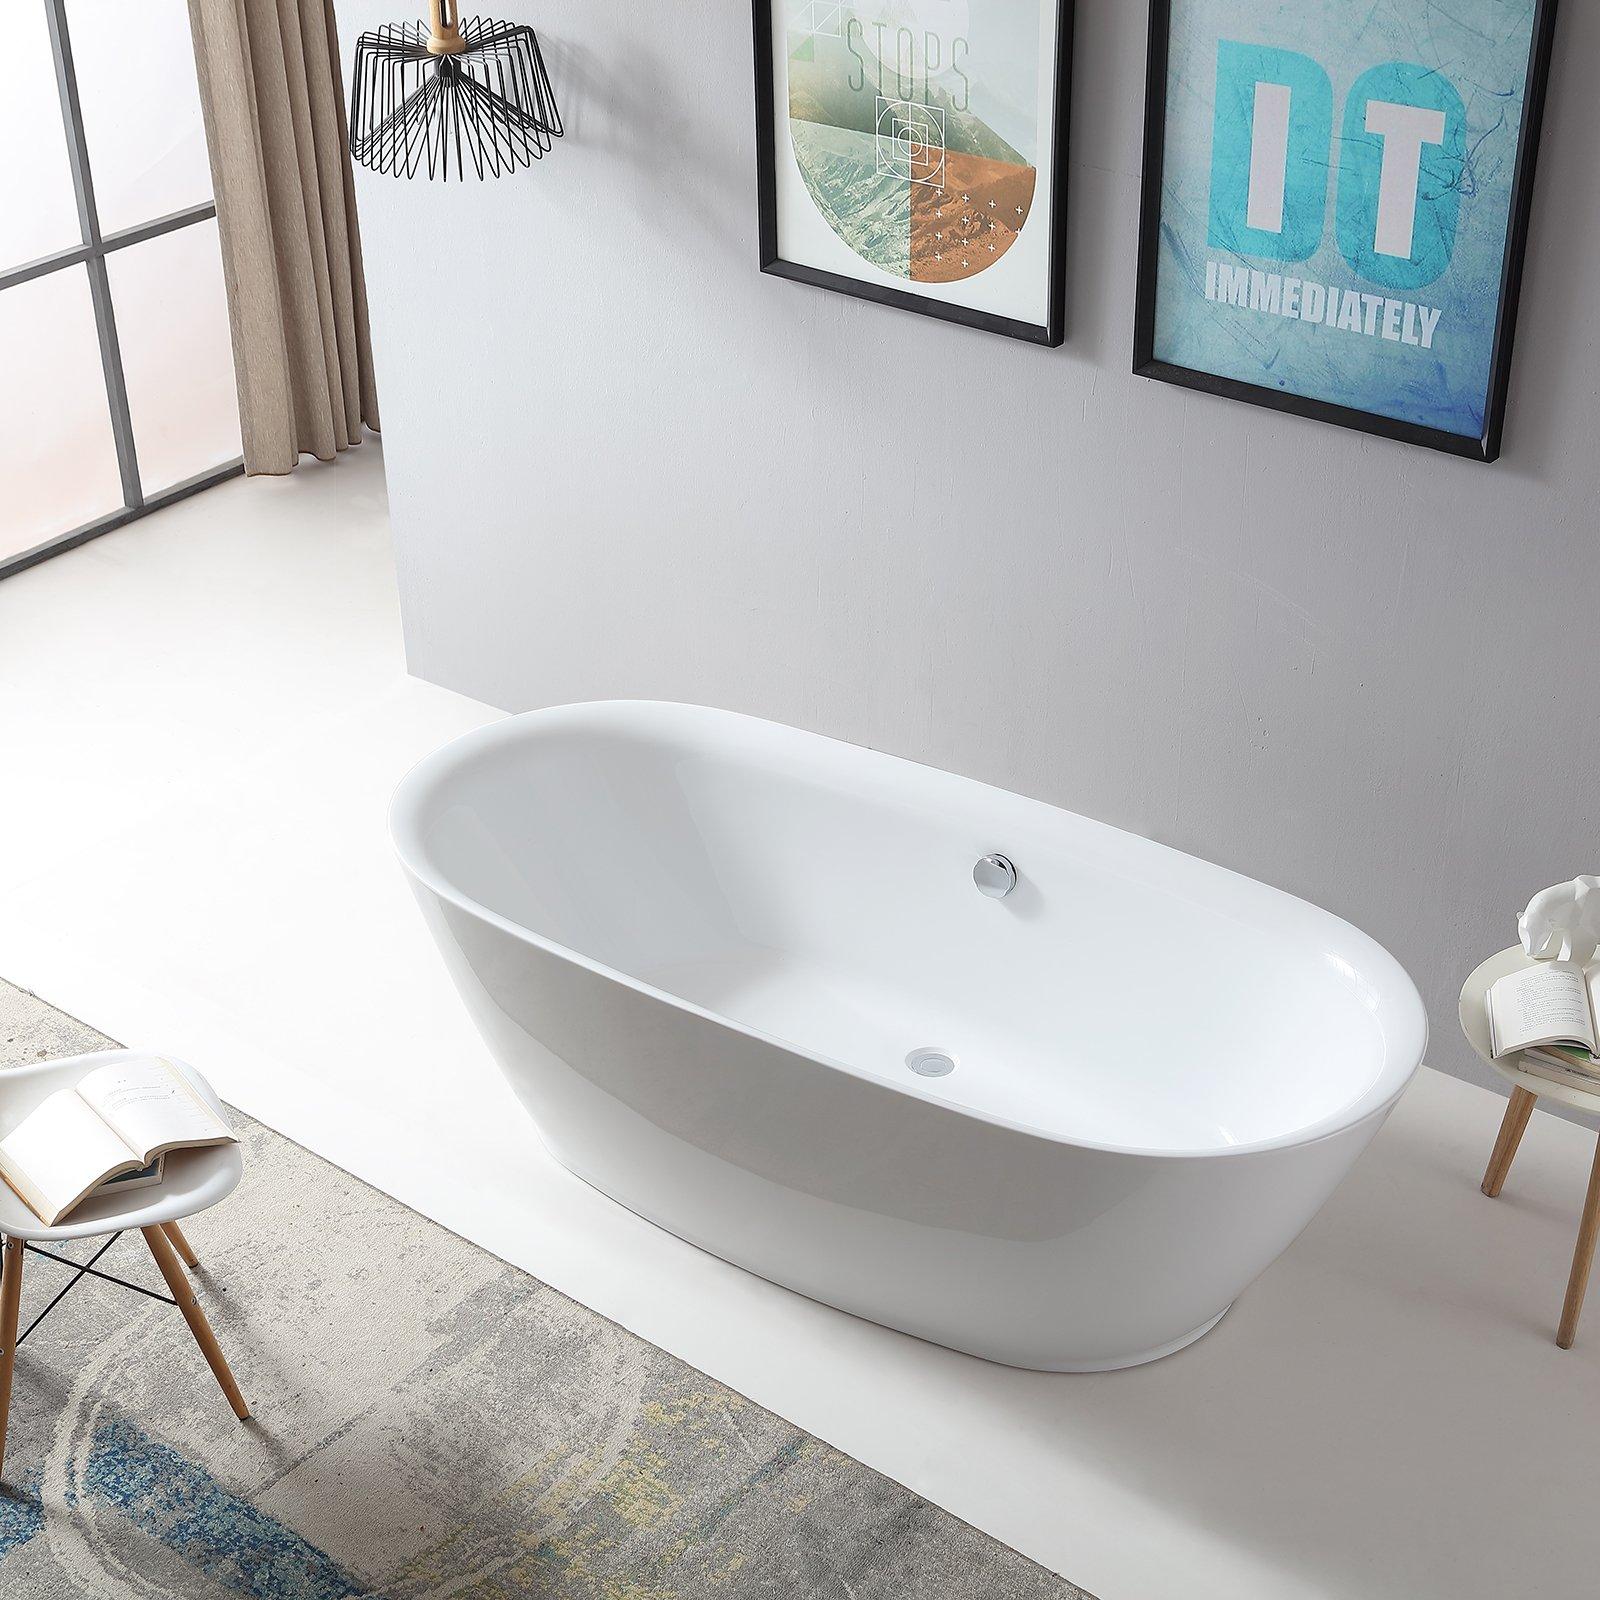 Freistehende Badewanne ROMA ACRYL weiß BS-916 180x84 inkl. Ab/ Überlauf